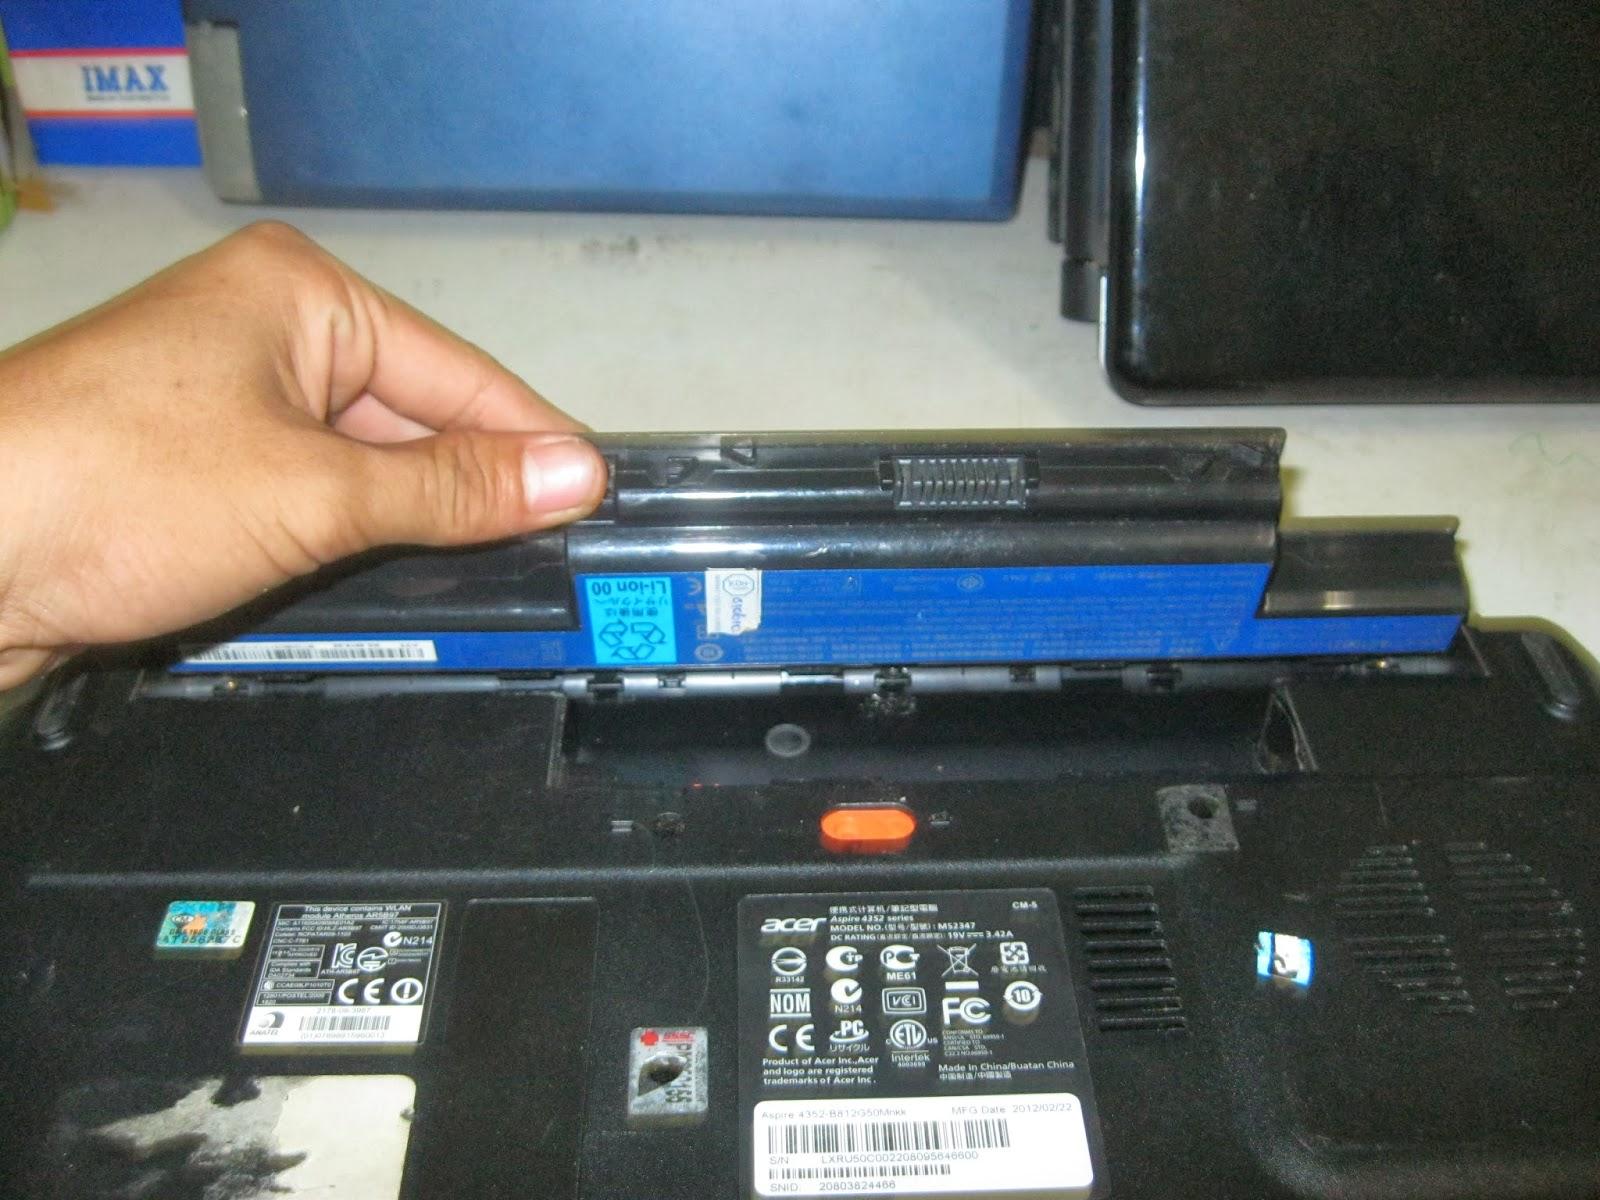 Cara Mengganti Keyboard Laptop Acer Kendari Komputer One 14 Z1401 Z1402 Melepas Baterai